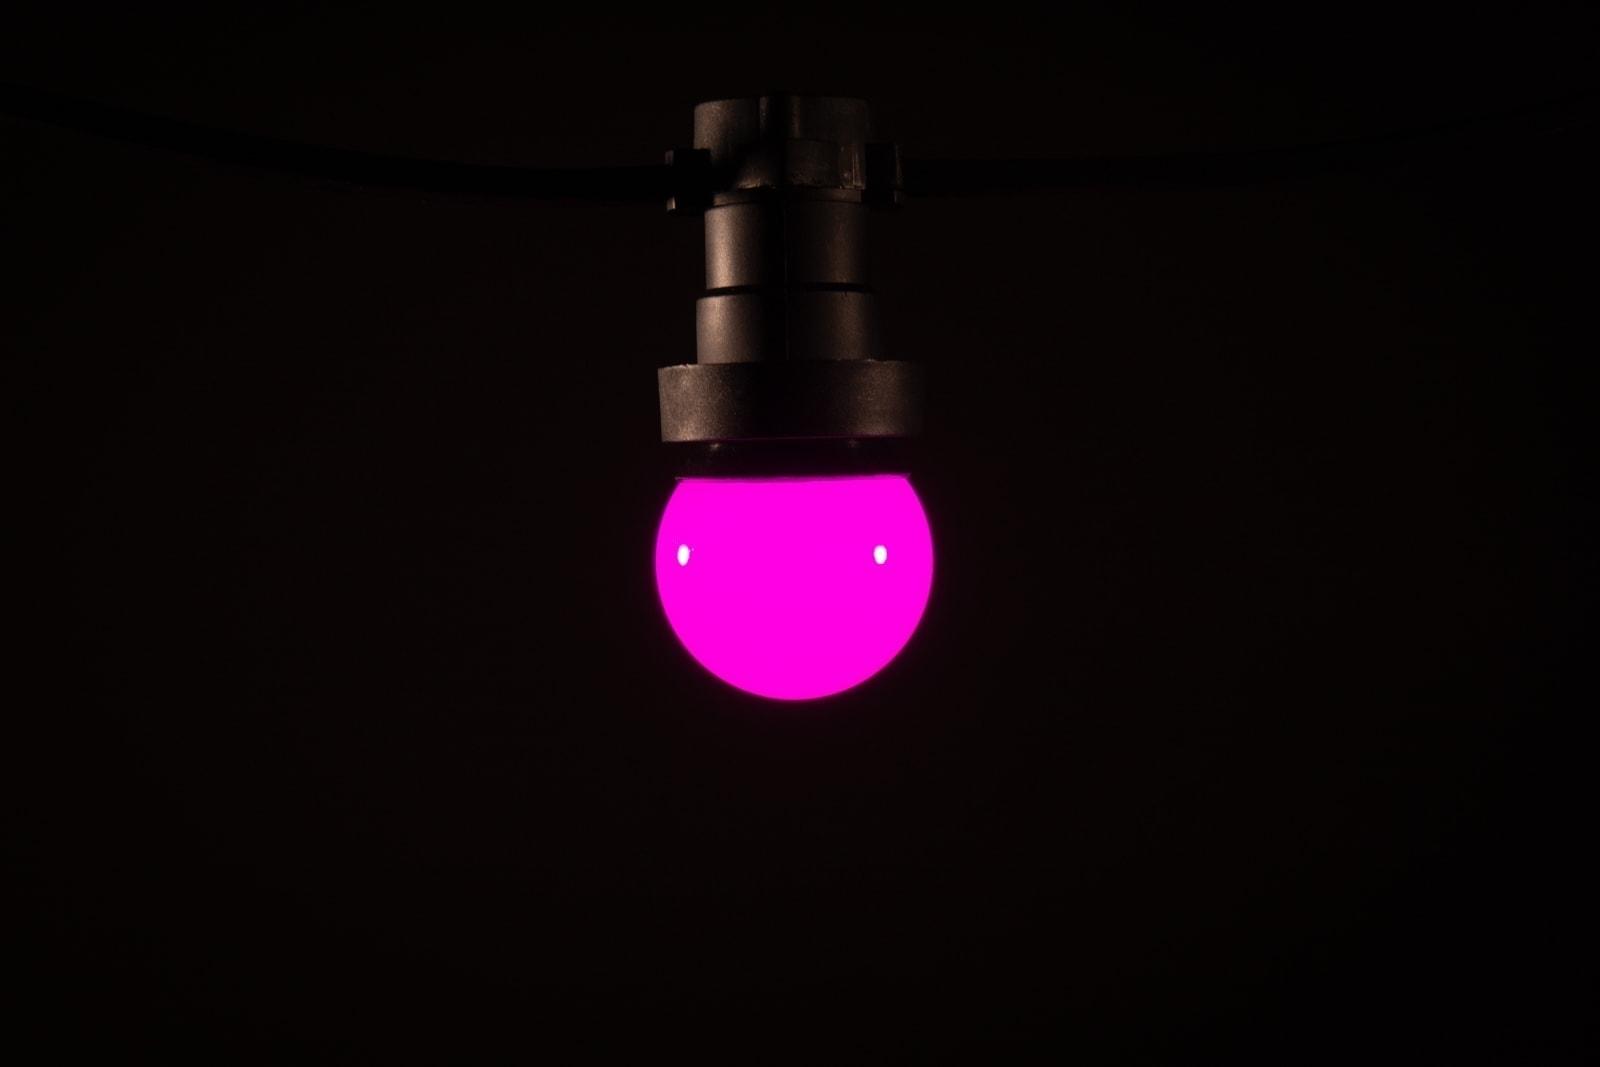 Prikkabel Led Lampen : Prikkabel led lamp u roze kerstverlichting buiten